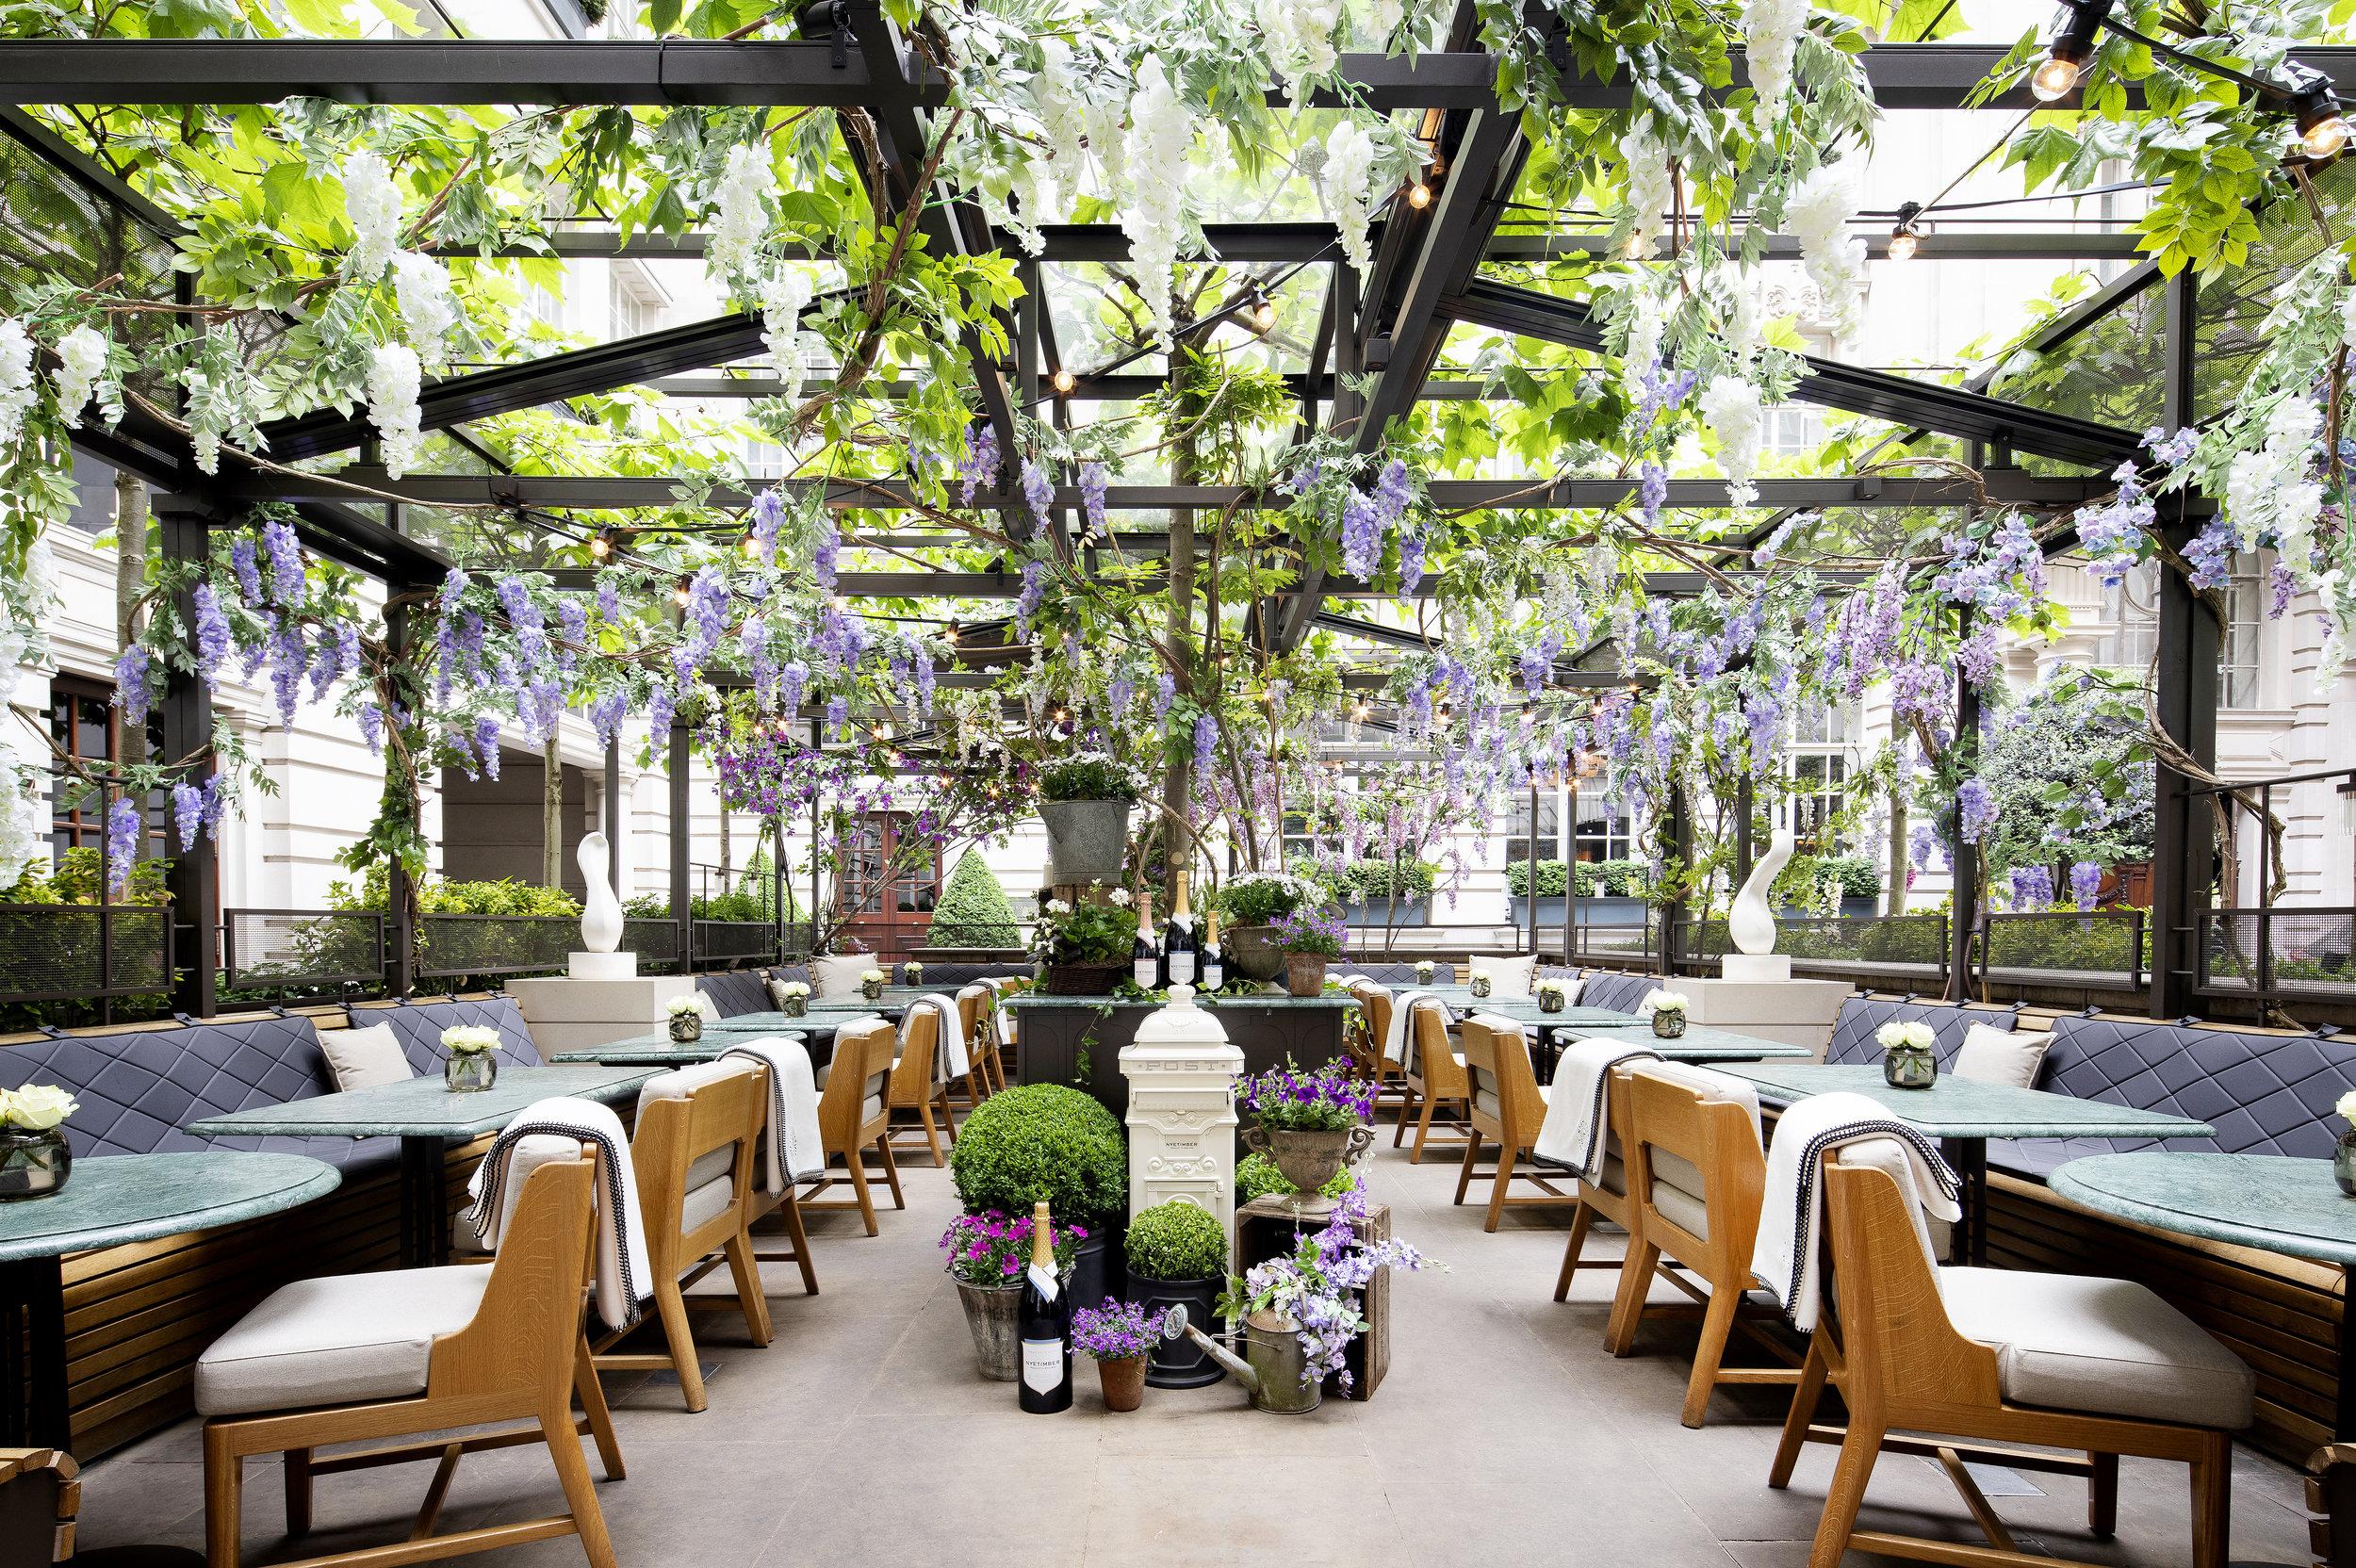 Holborn Dining Room_The Nyetimber Secret Garden_Central Piece©John Carey (1).jpg